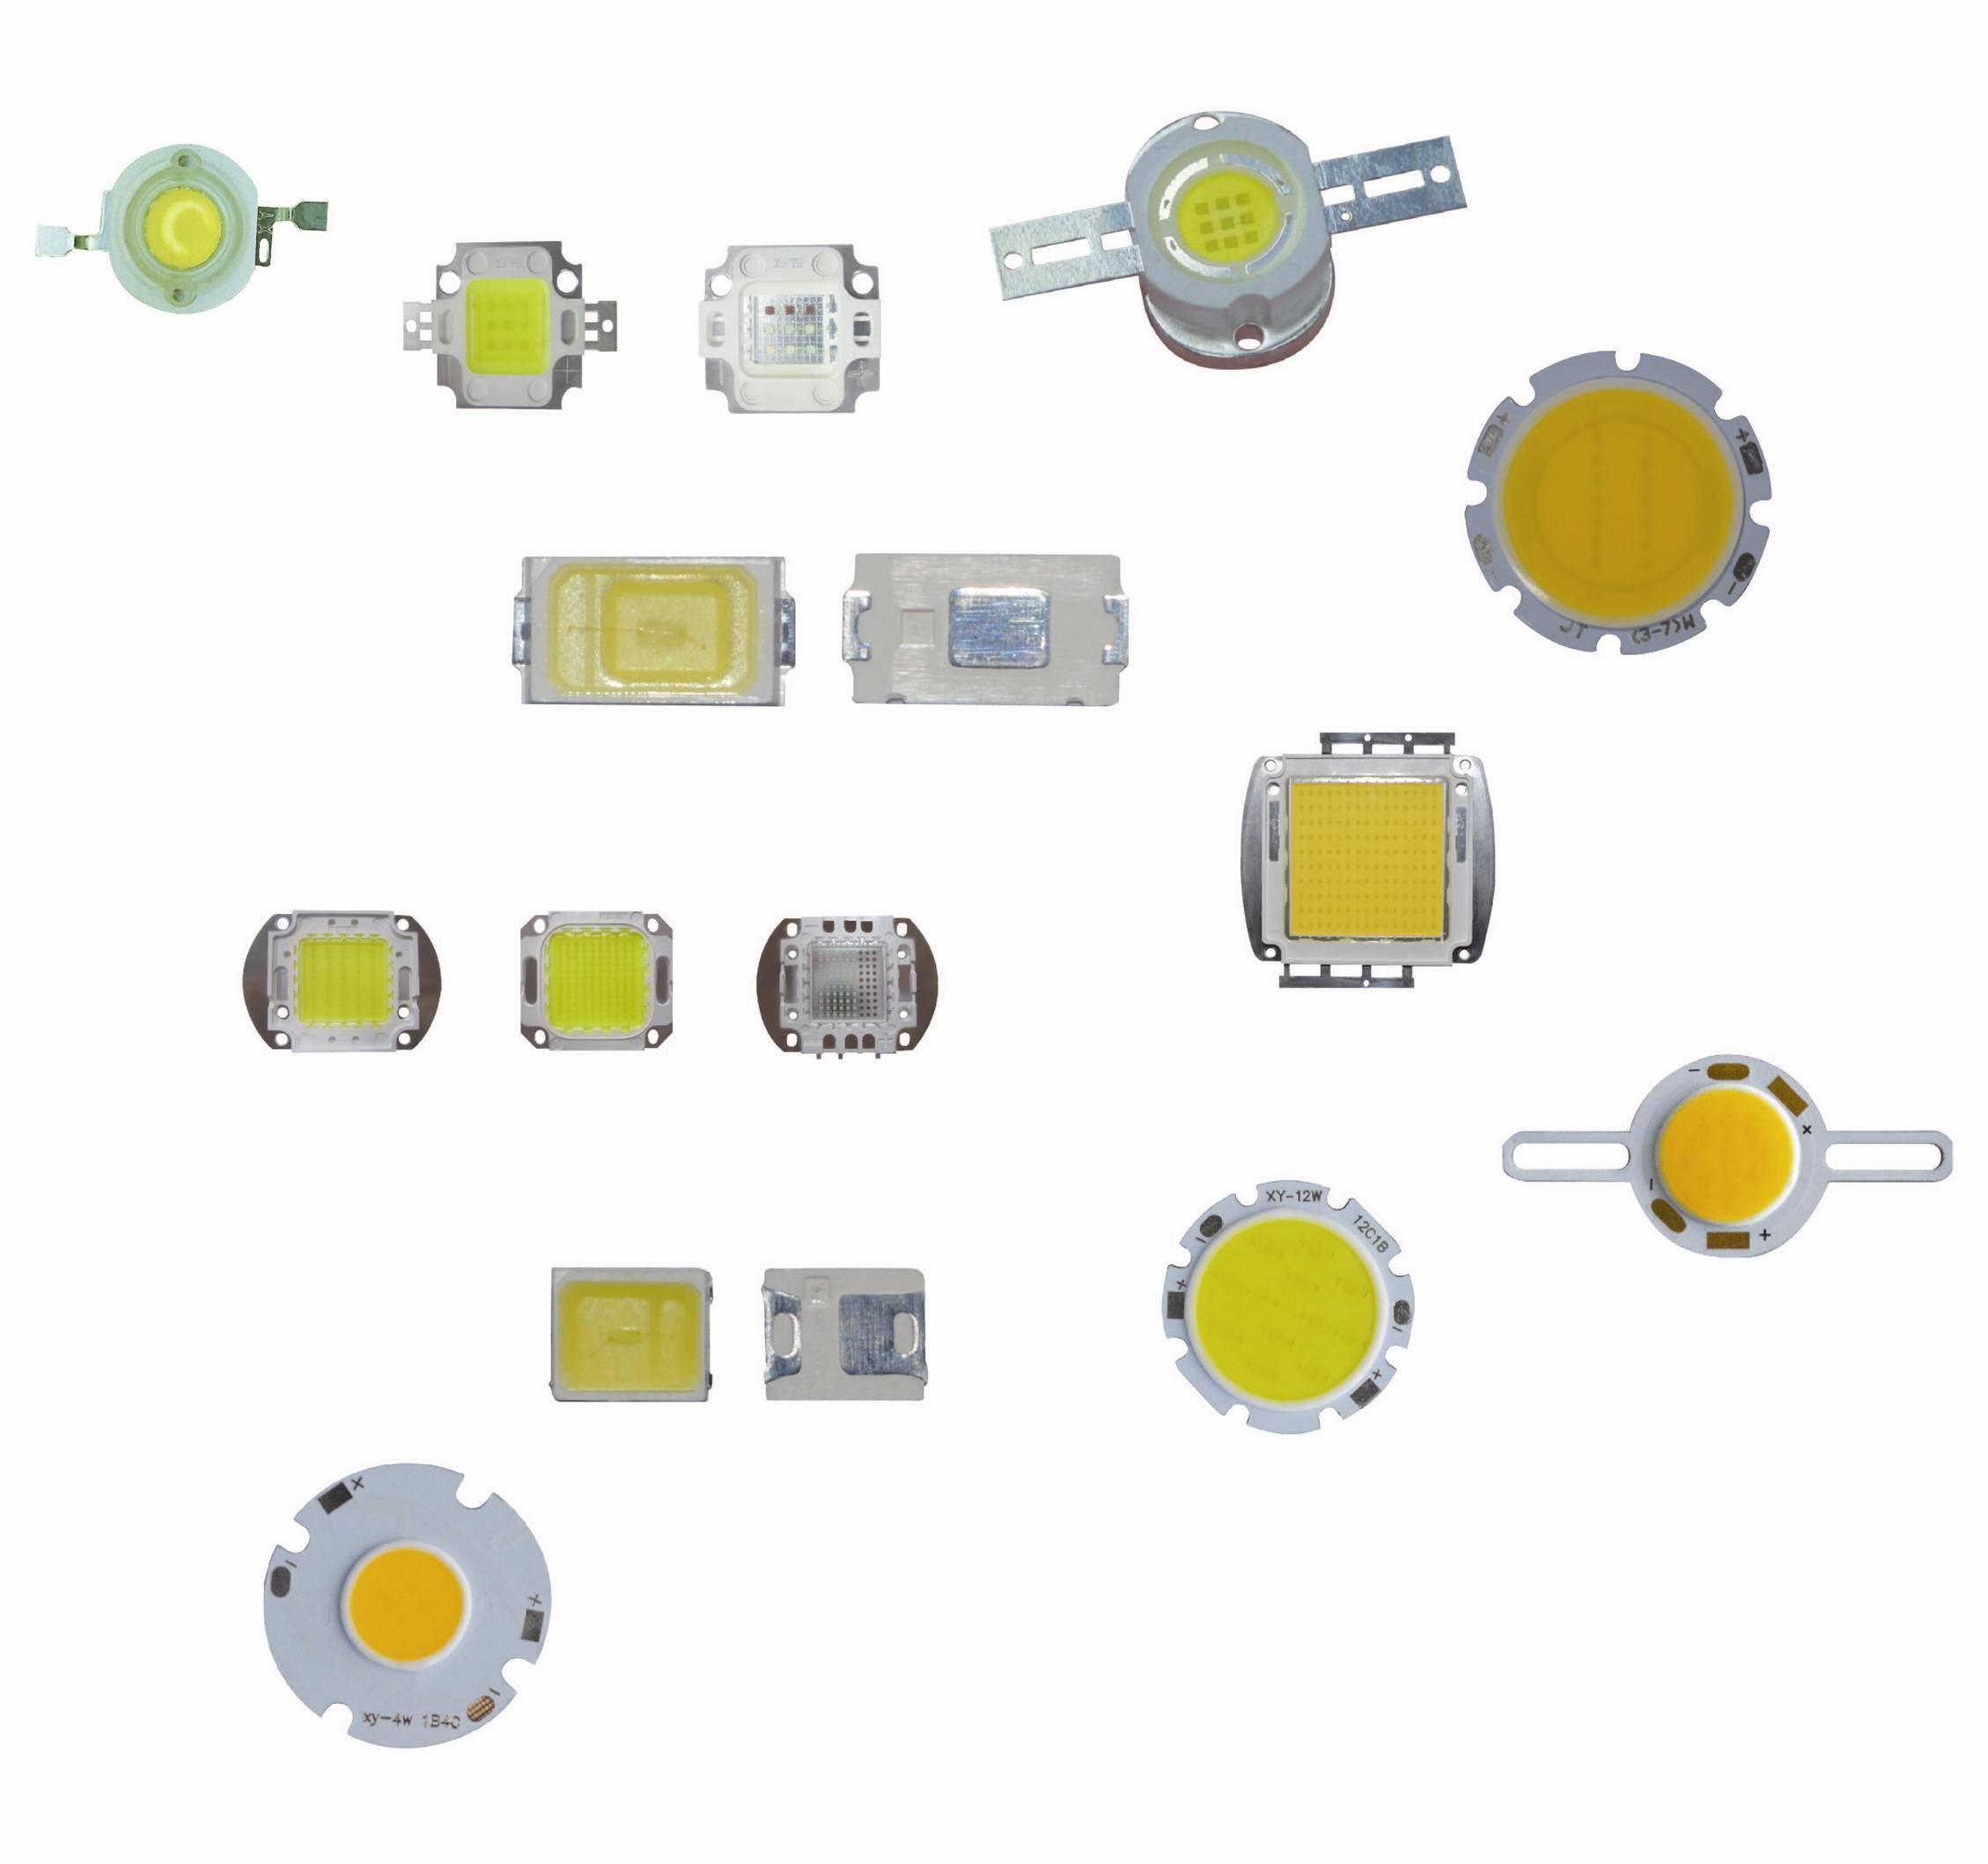 high power led module white light source